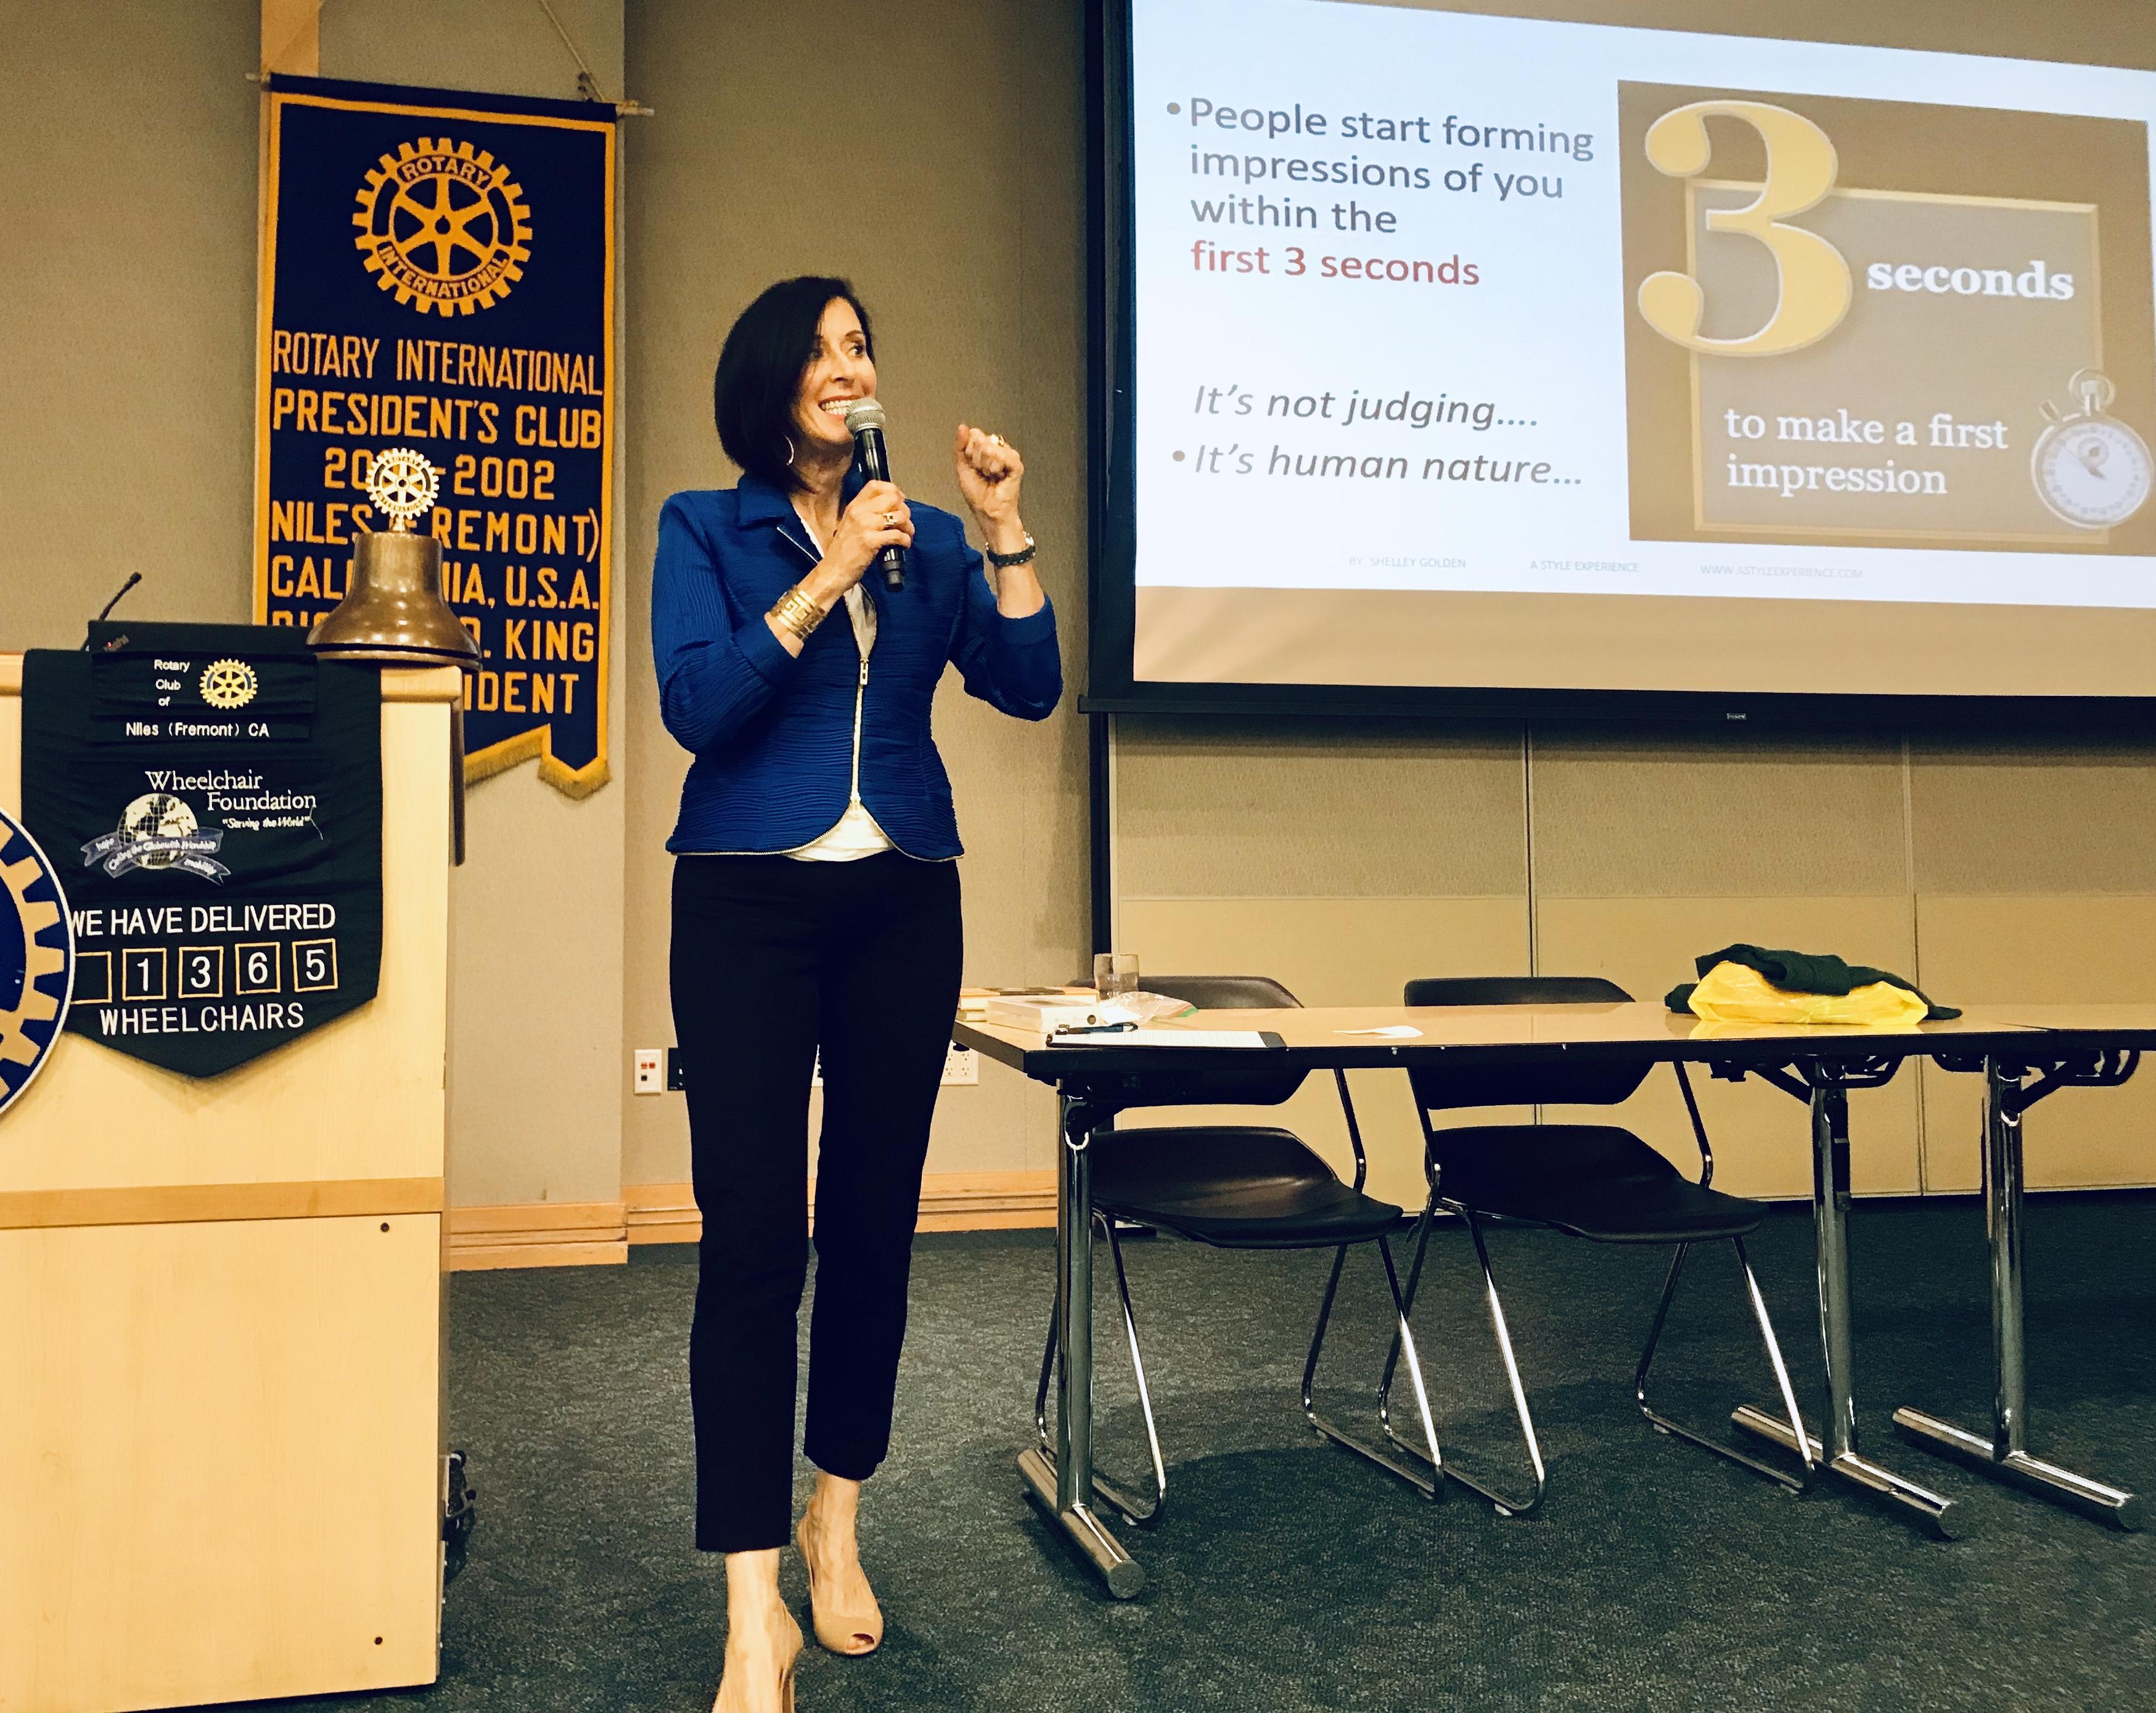 Presentation Niles Rotary